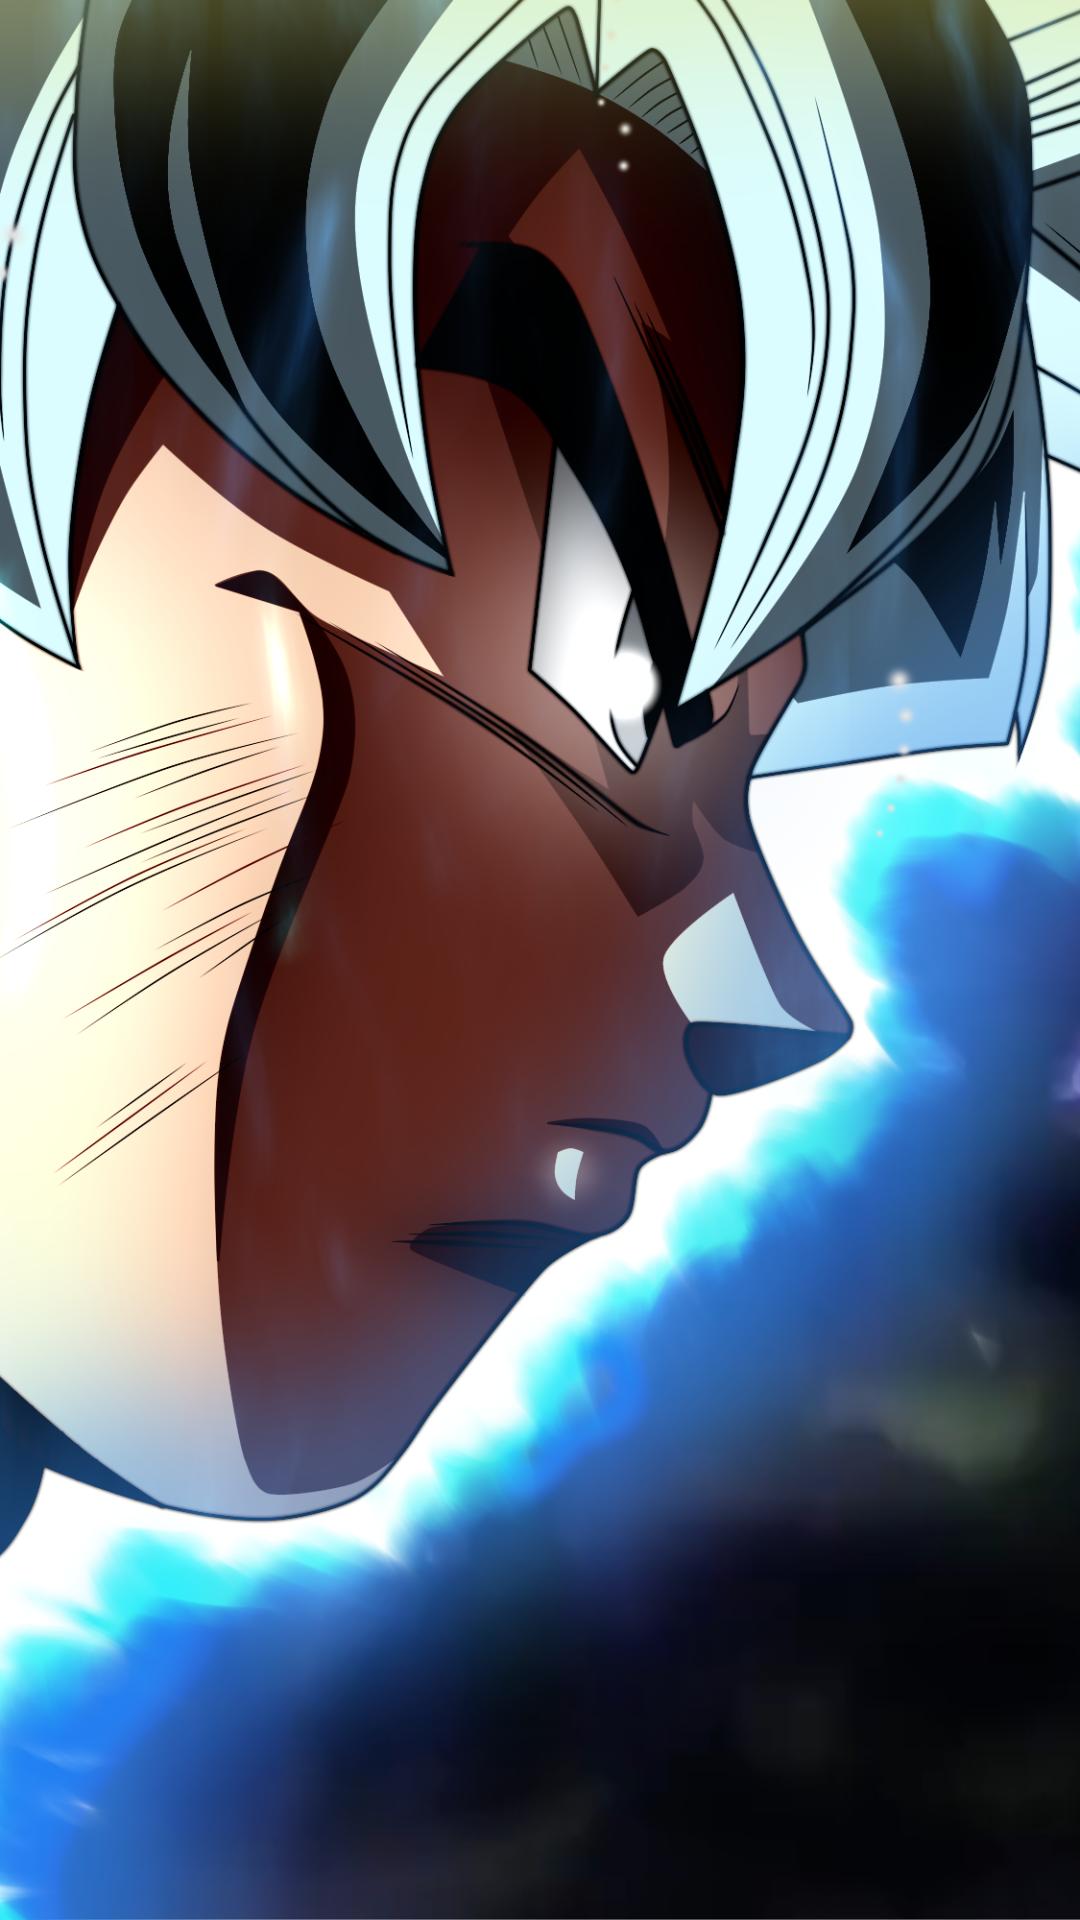 Anime dragon ball super 1080x1920 wallpaper id 706868 mobile abyss - Dragon ball super wallpaper 1080x1920 ...